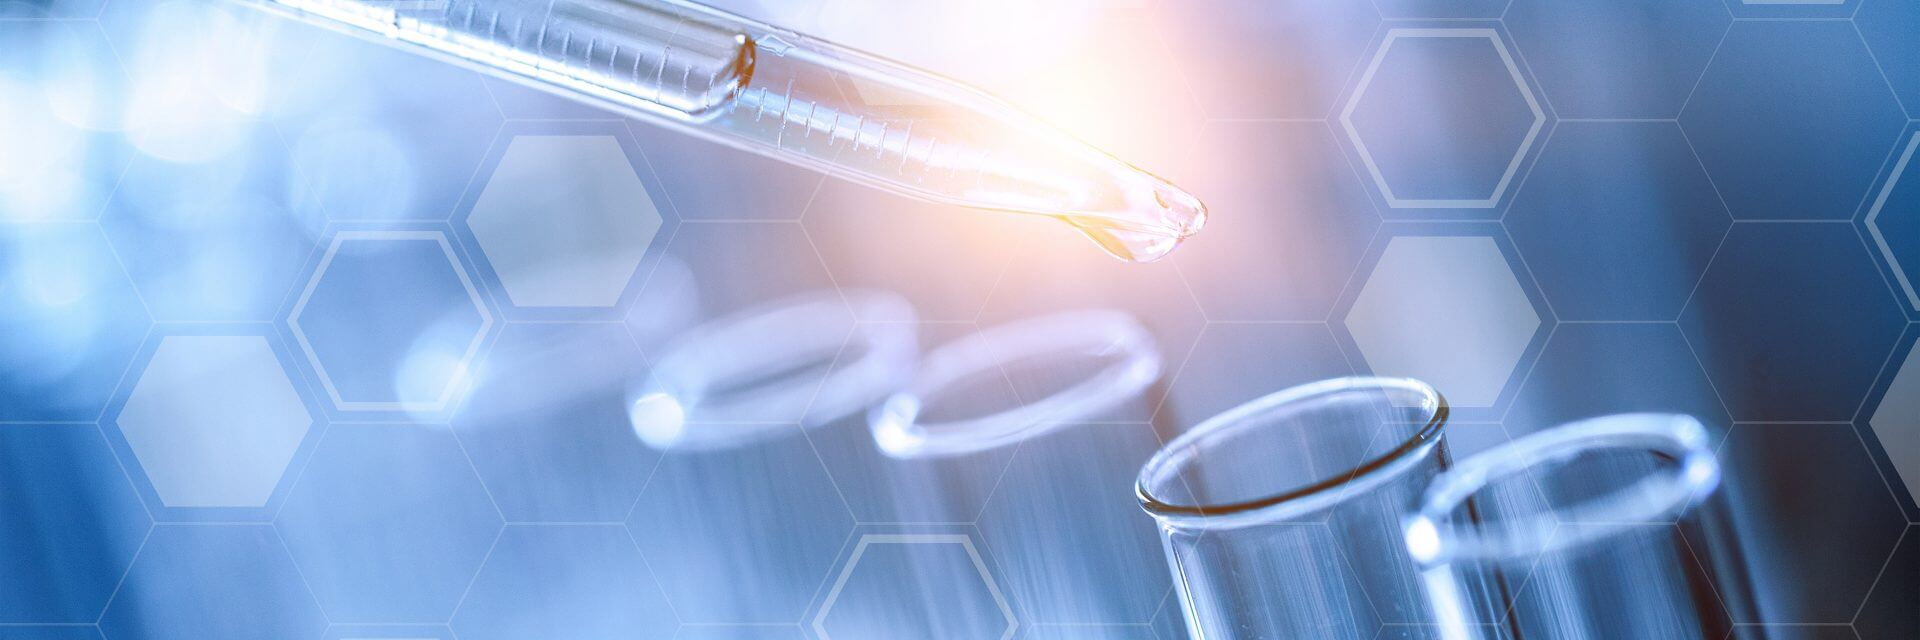 test processing lab design